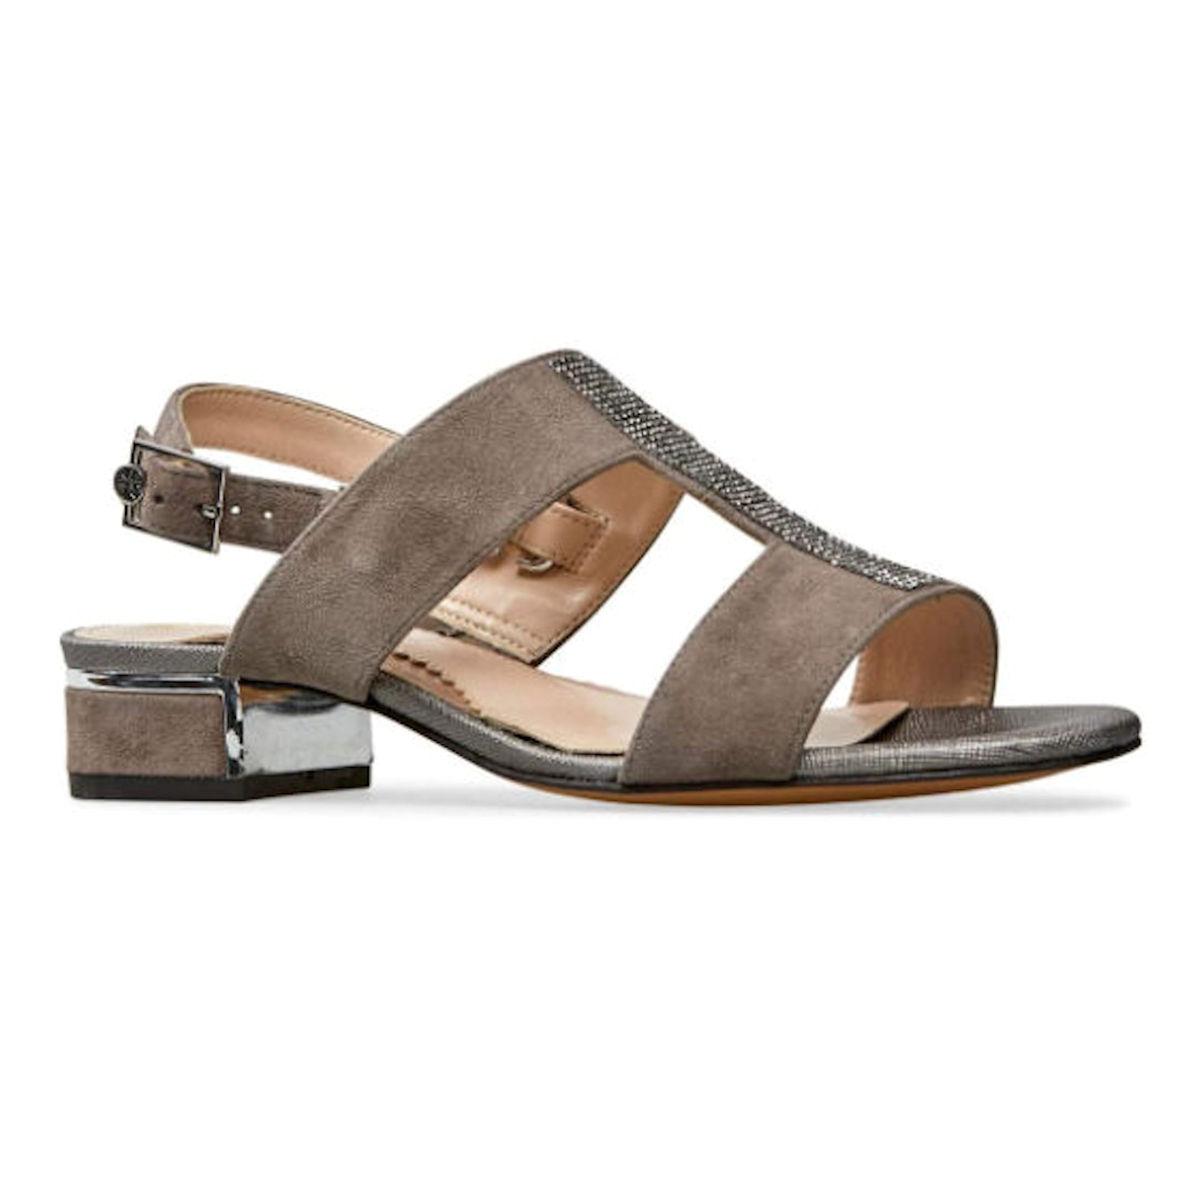 Van Dal Ione II Moss Suede Sling Back Womens Sandal